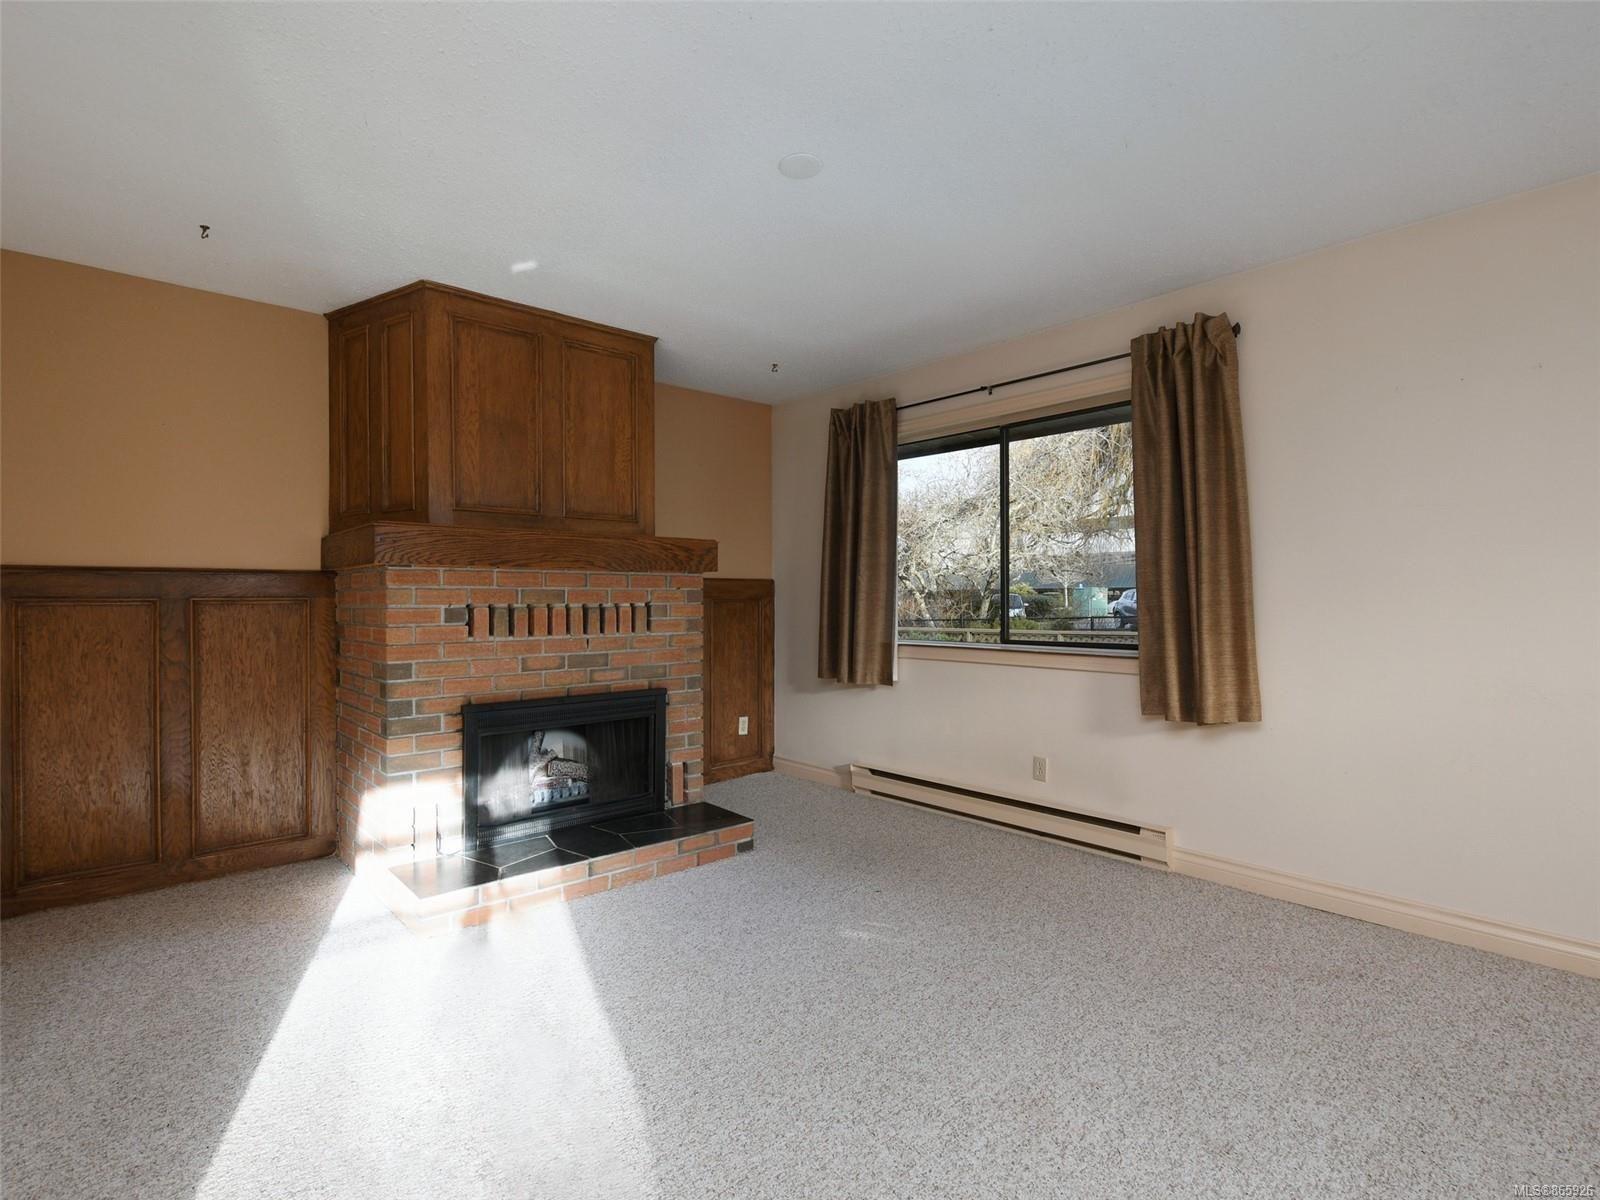 Photo 3: Photos: 8 4350 West Saanich Rd in : SW Royal Oak Row/Townhouse for sale (Saanich West)  : MLS®# 865926